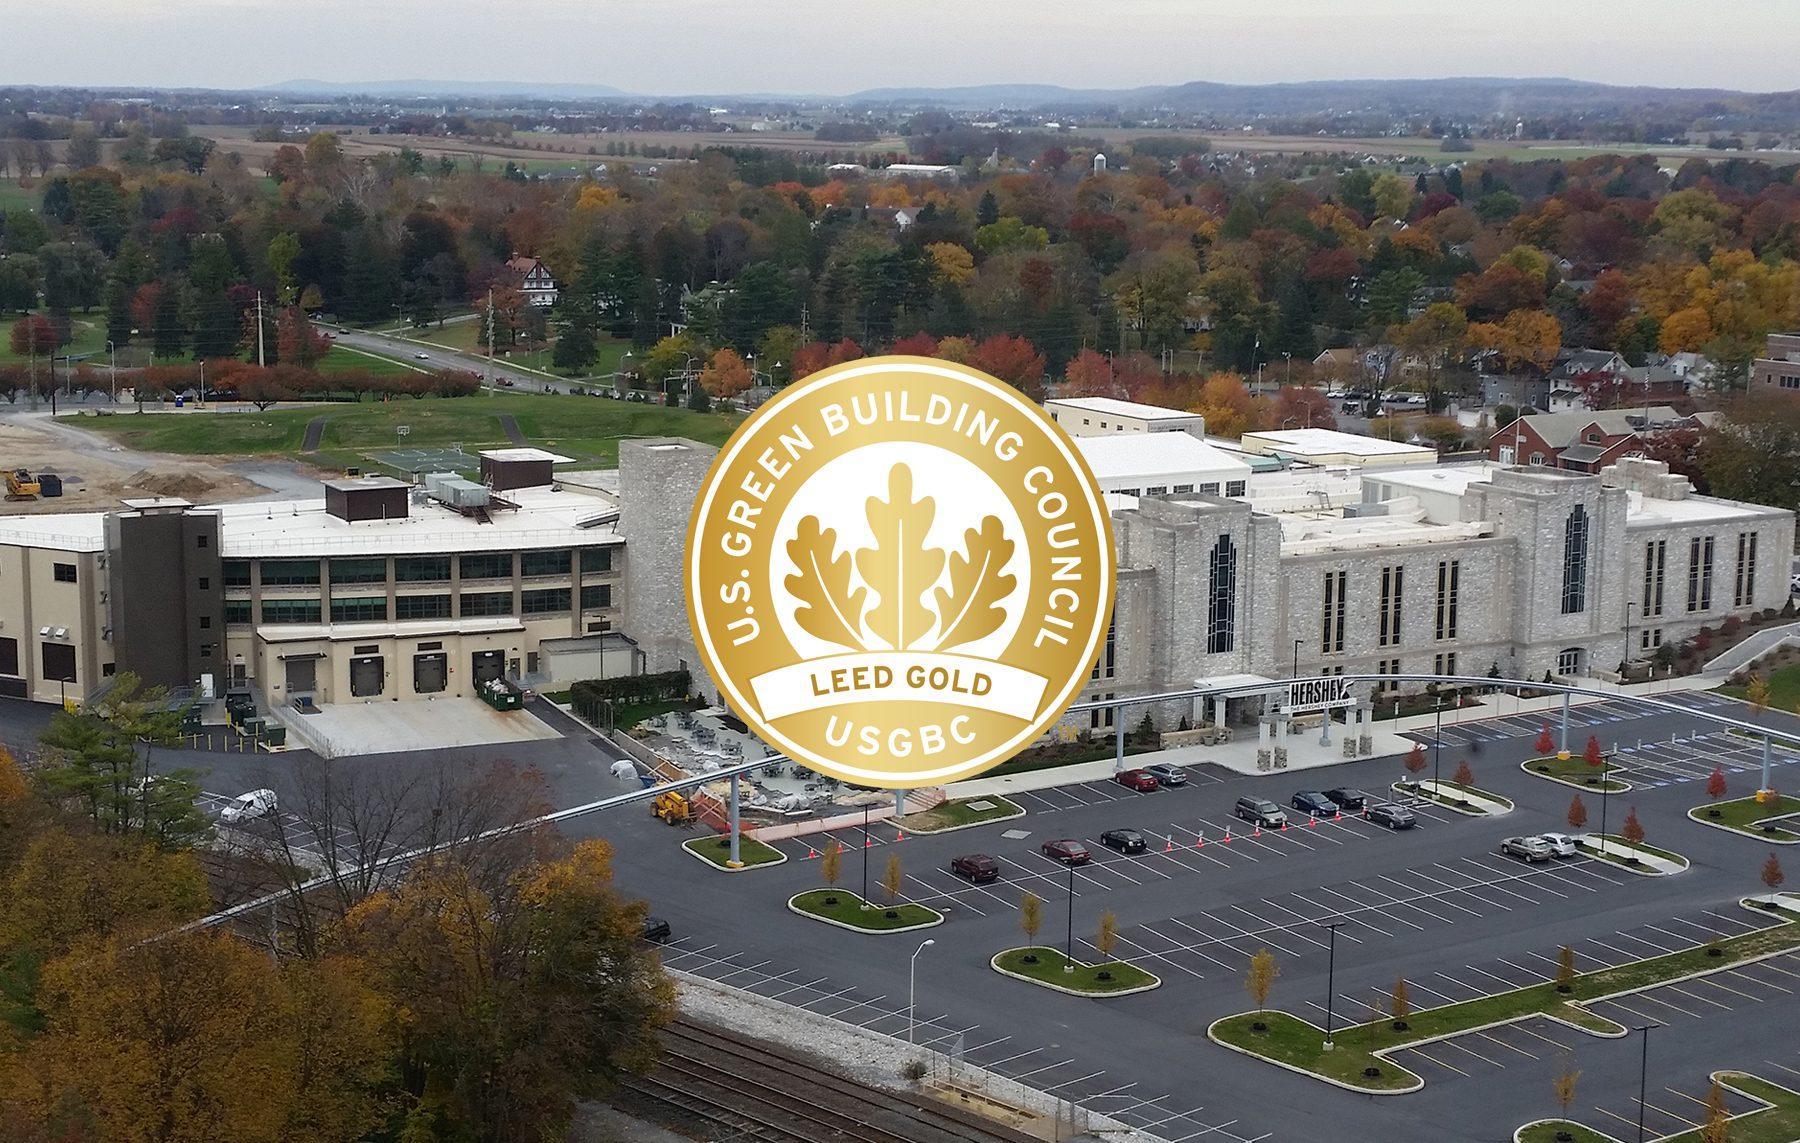 Hershey Next Century Leed Gold